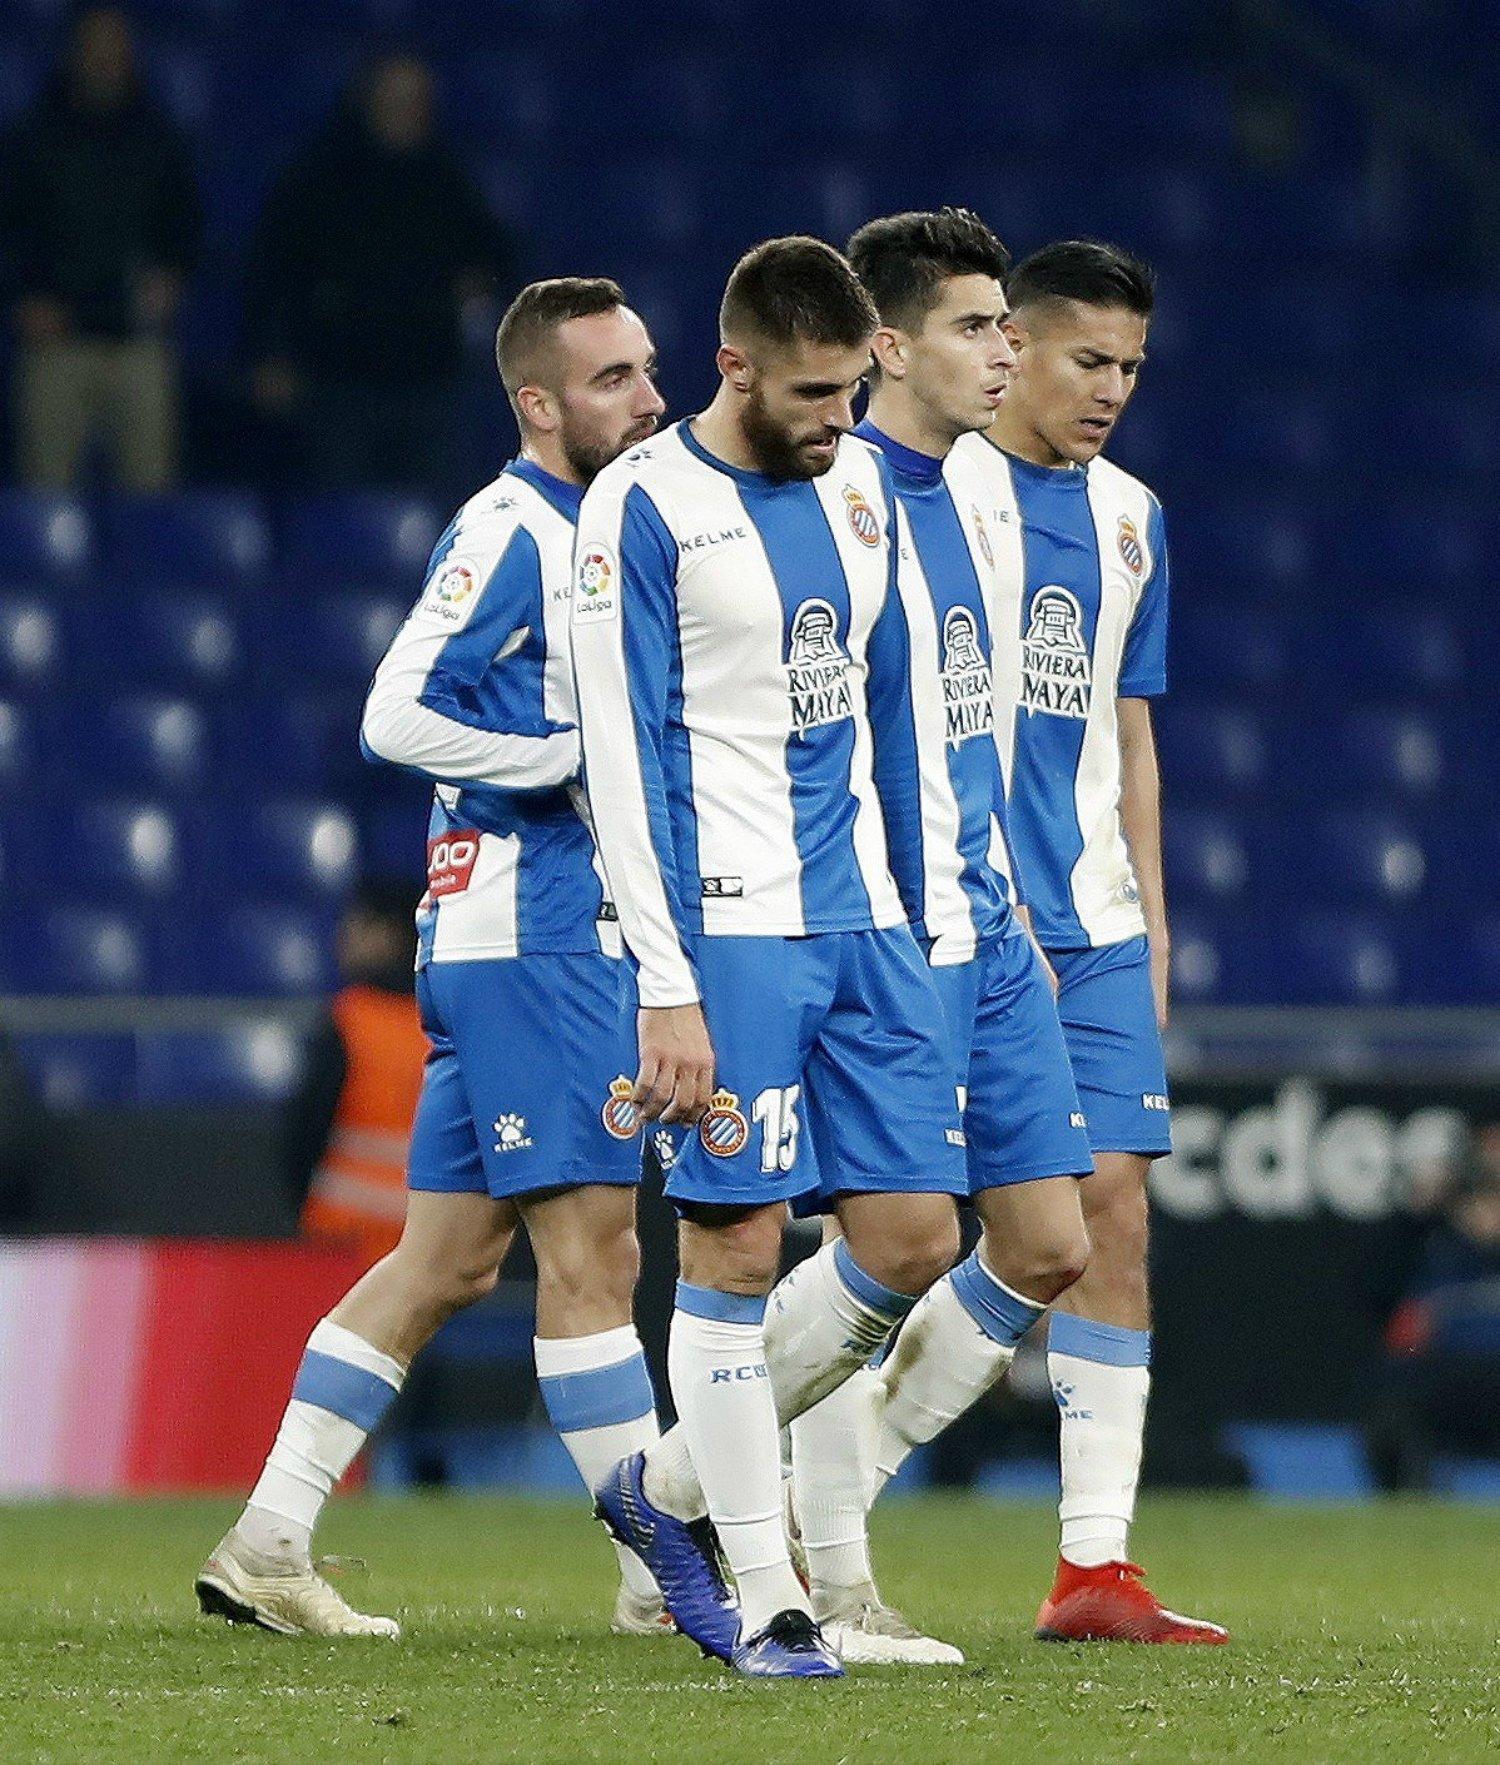 David Lopez Roca Duarte Darder Espanyol Betis EFE